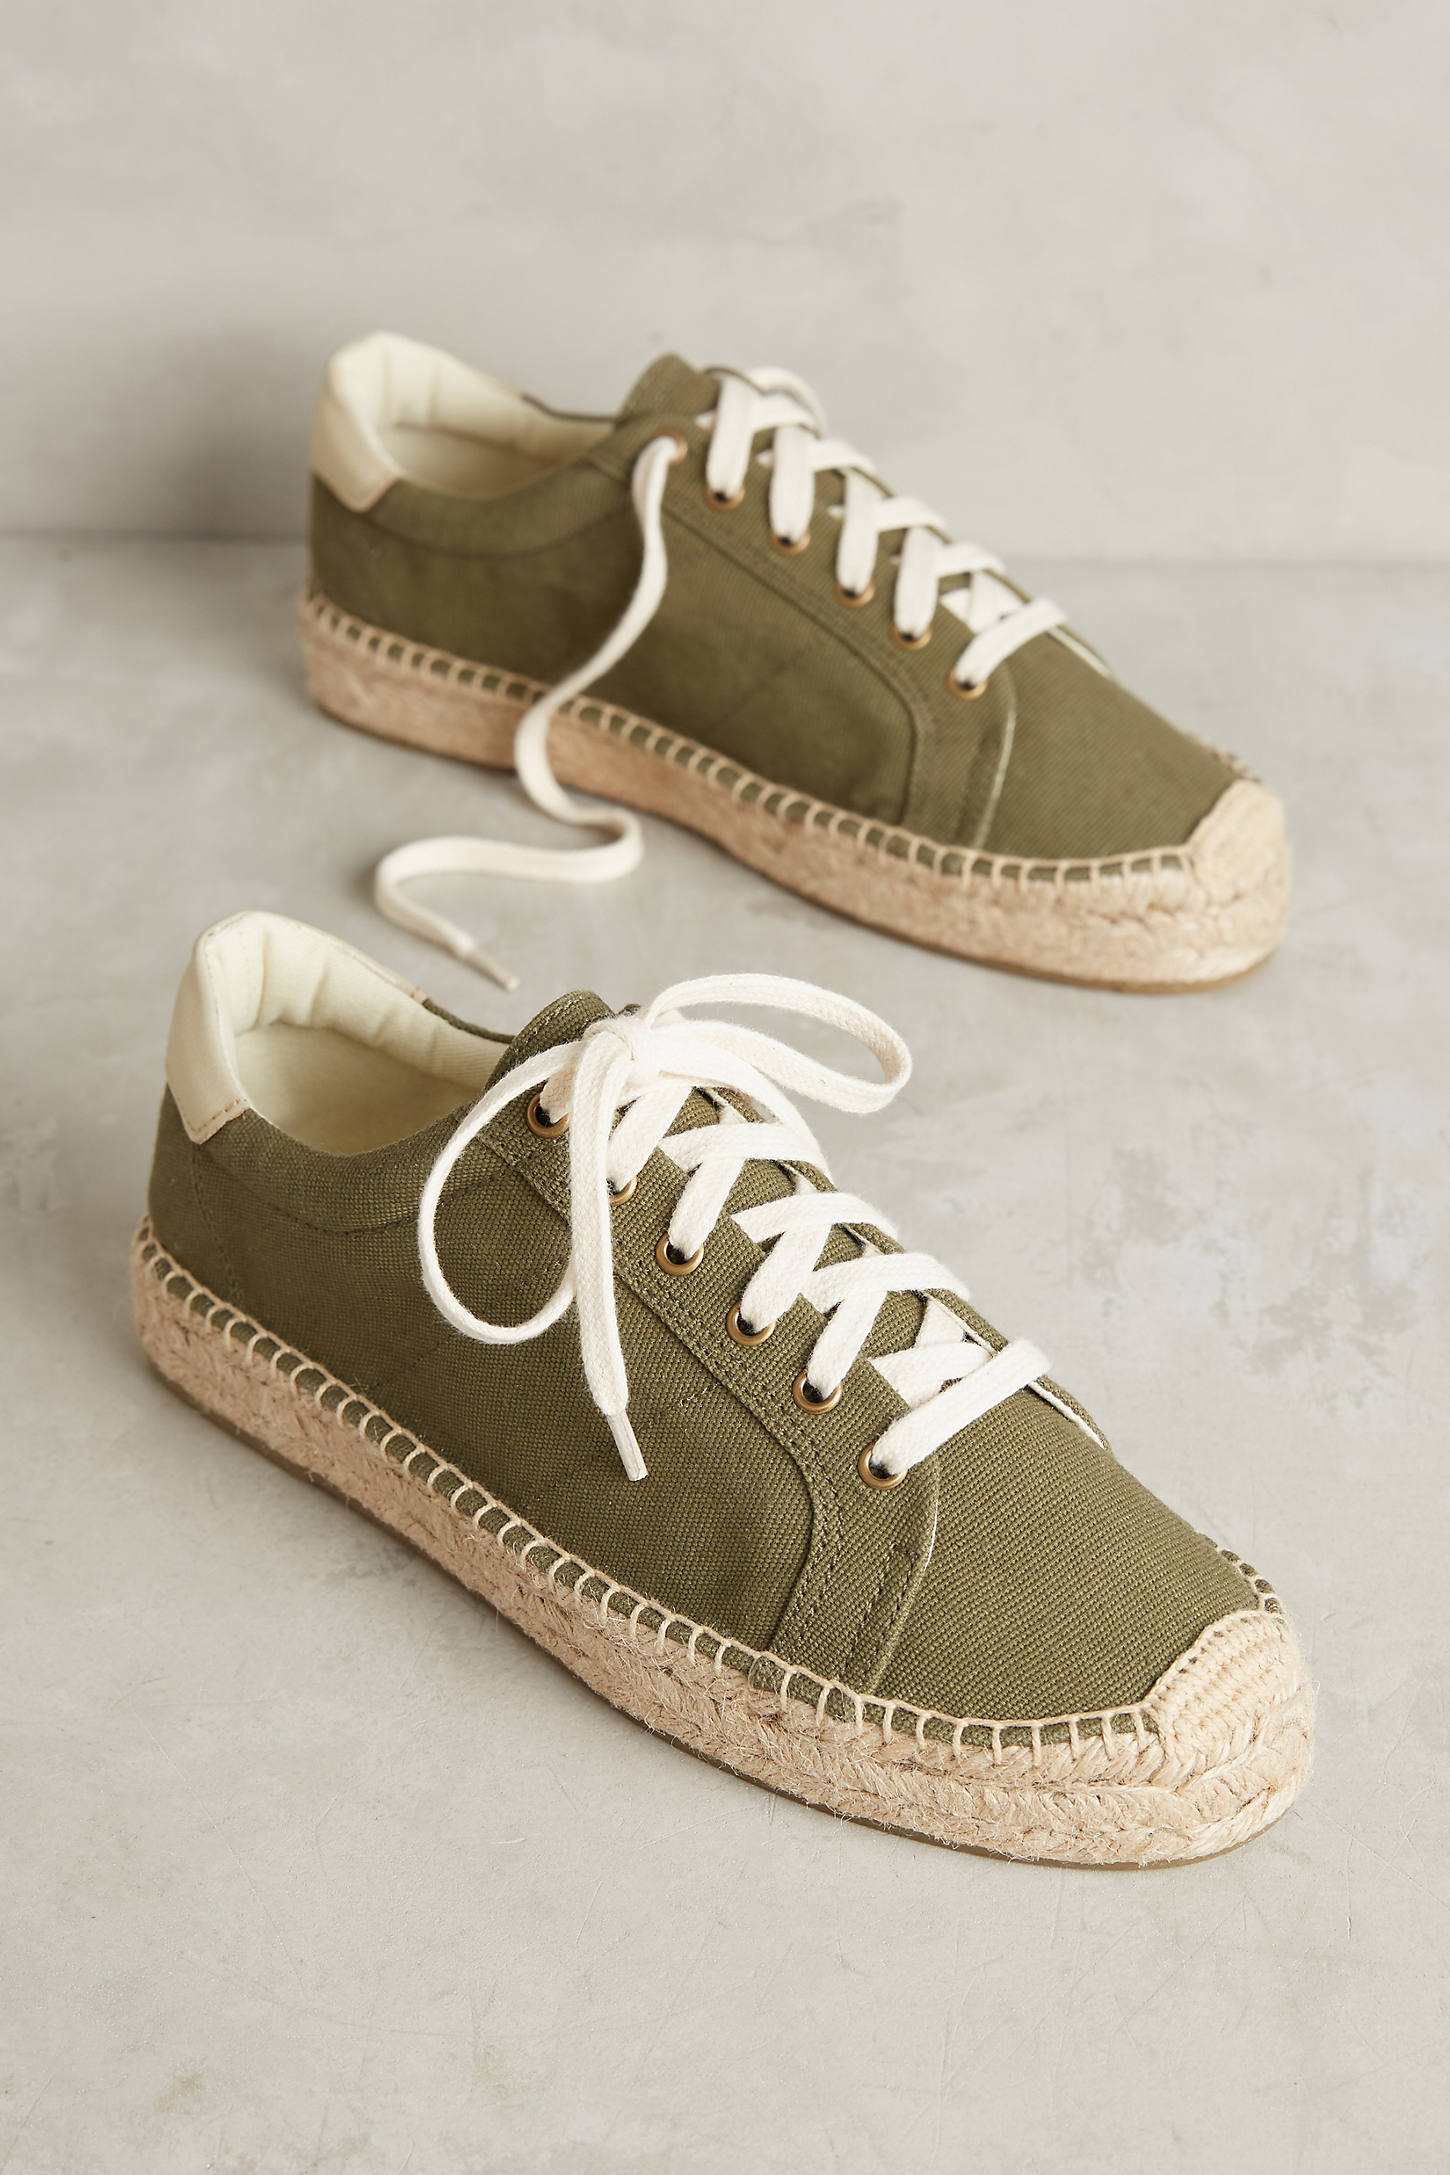 Soludos Army Tennis Espadrille Sneakers